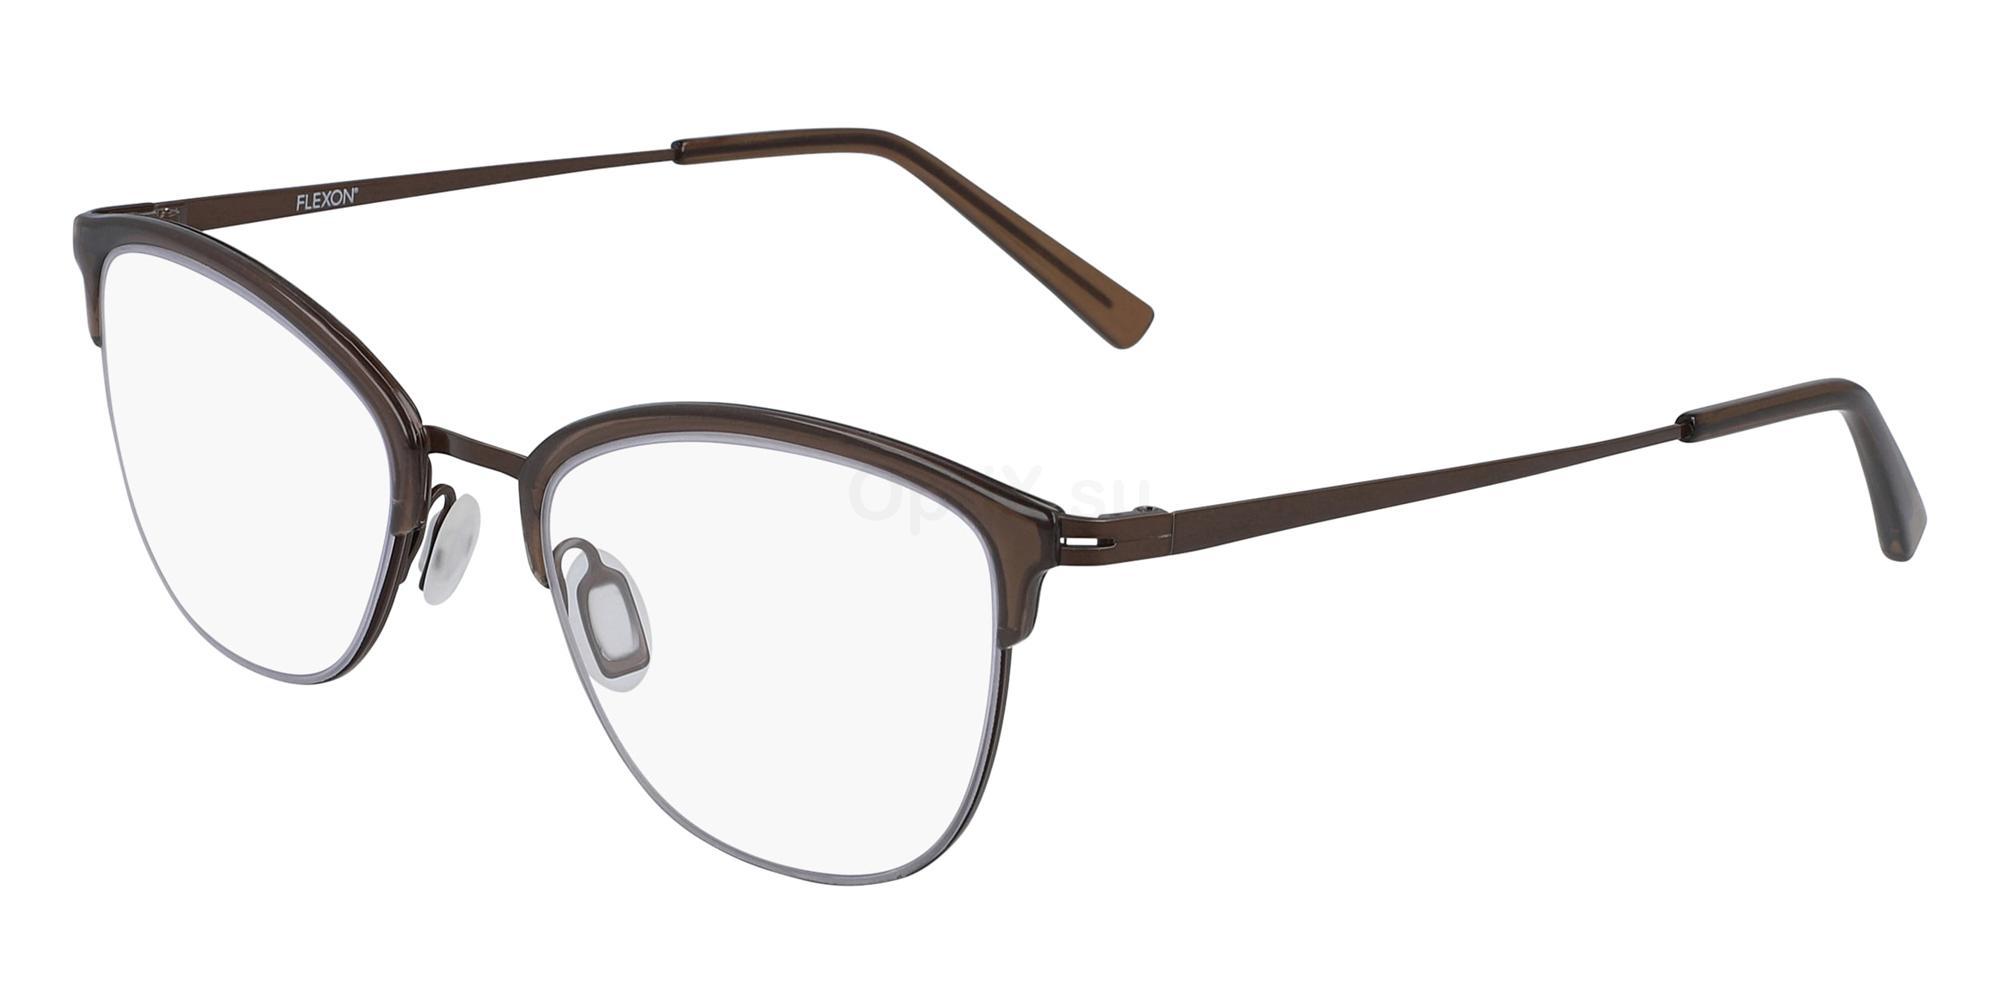 210 FLEXON W3023 Glasses, Flexon